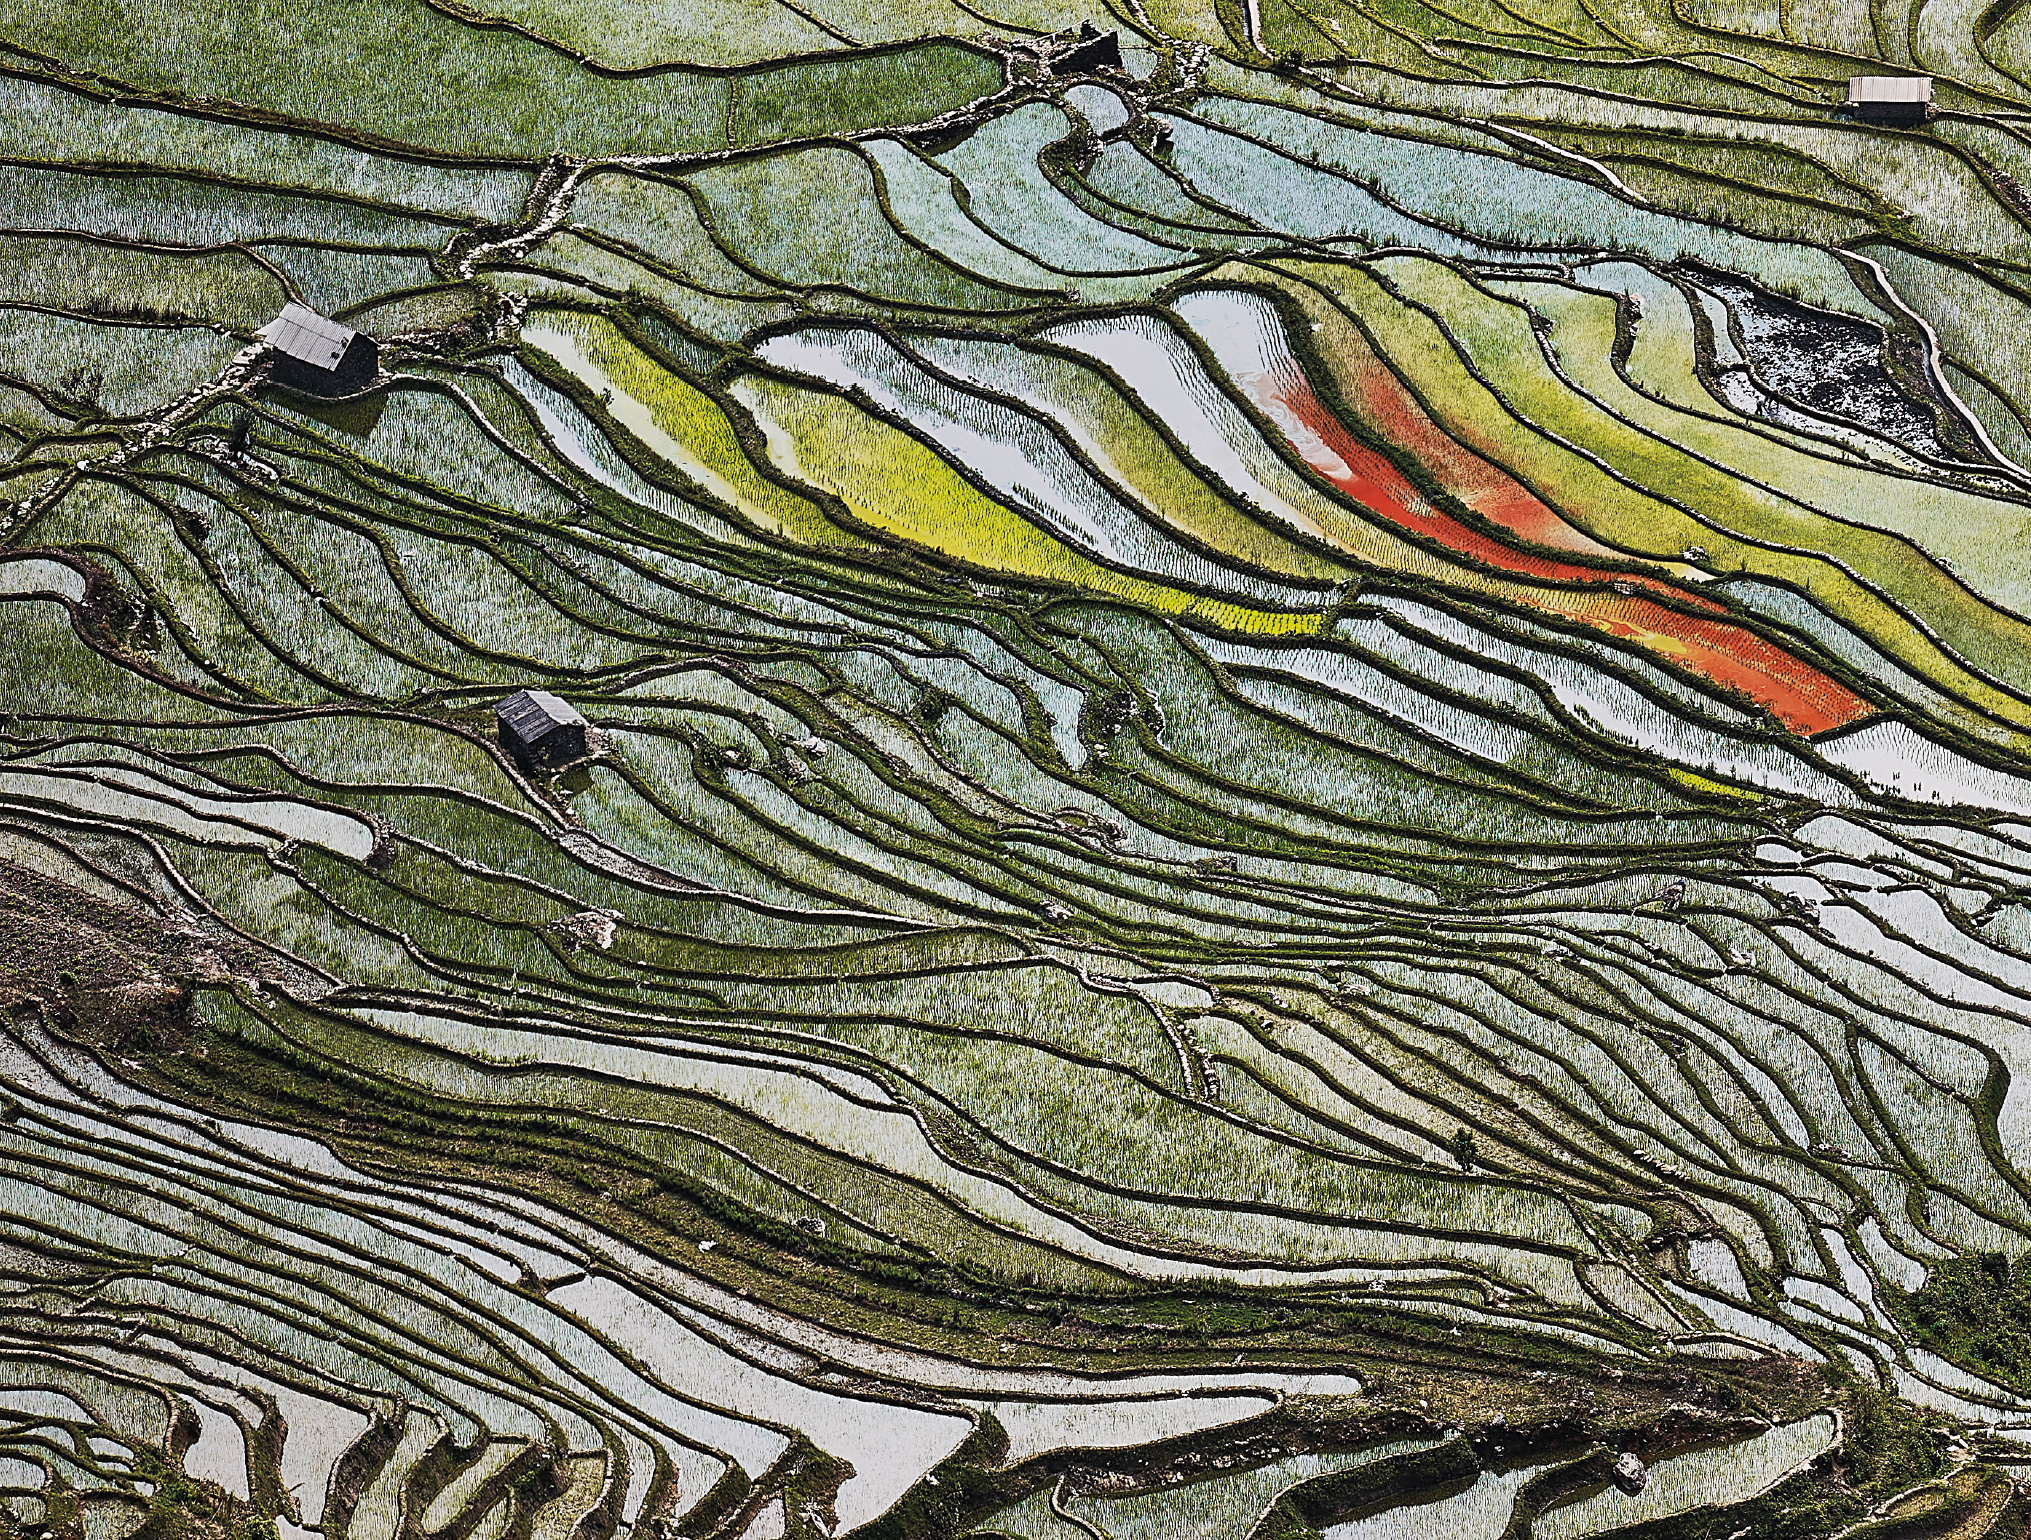 Edward Burtynsky | Rice Terraces #2, Western Yunnan Province, China, 2012 | Estimate: £10,000-15,000